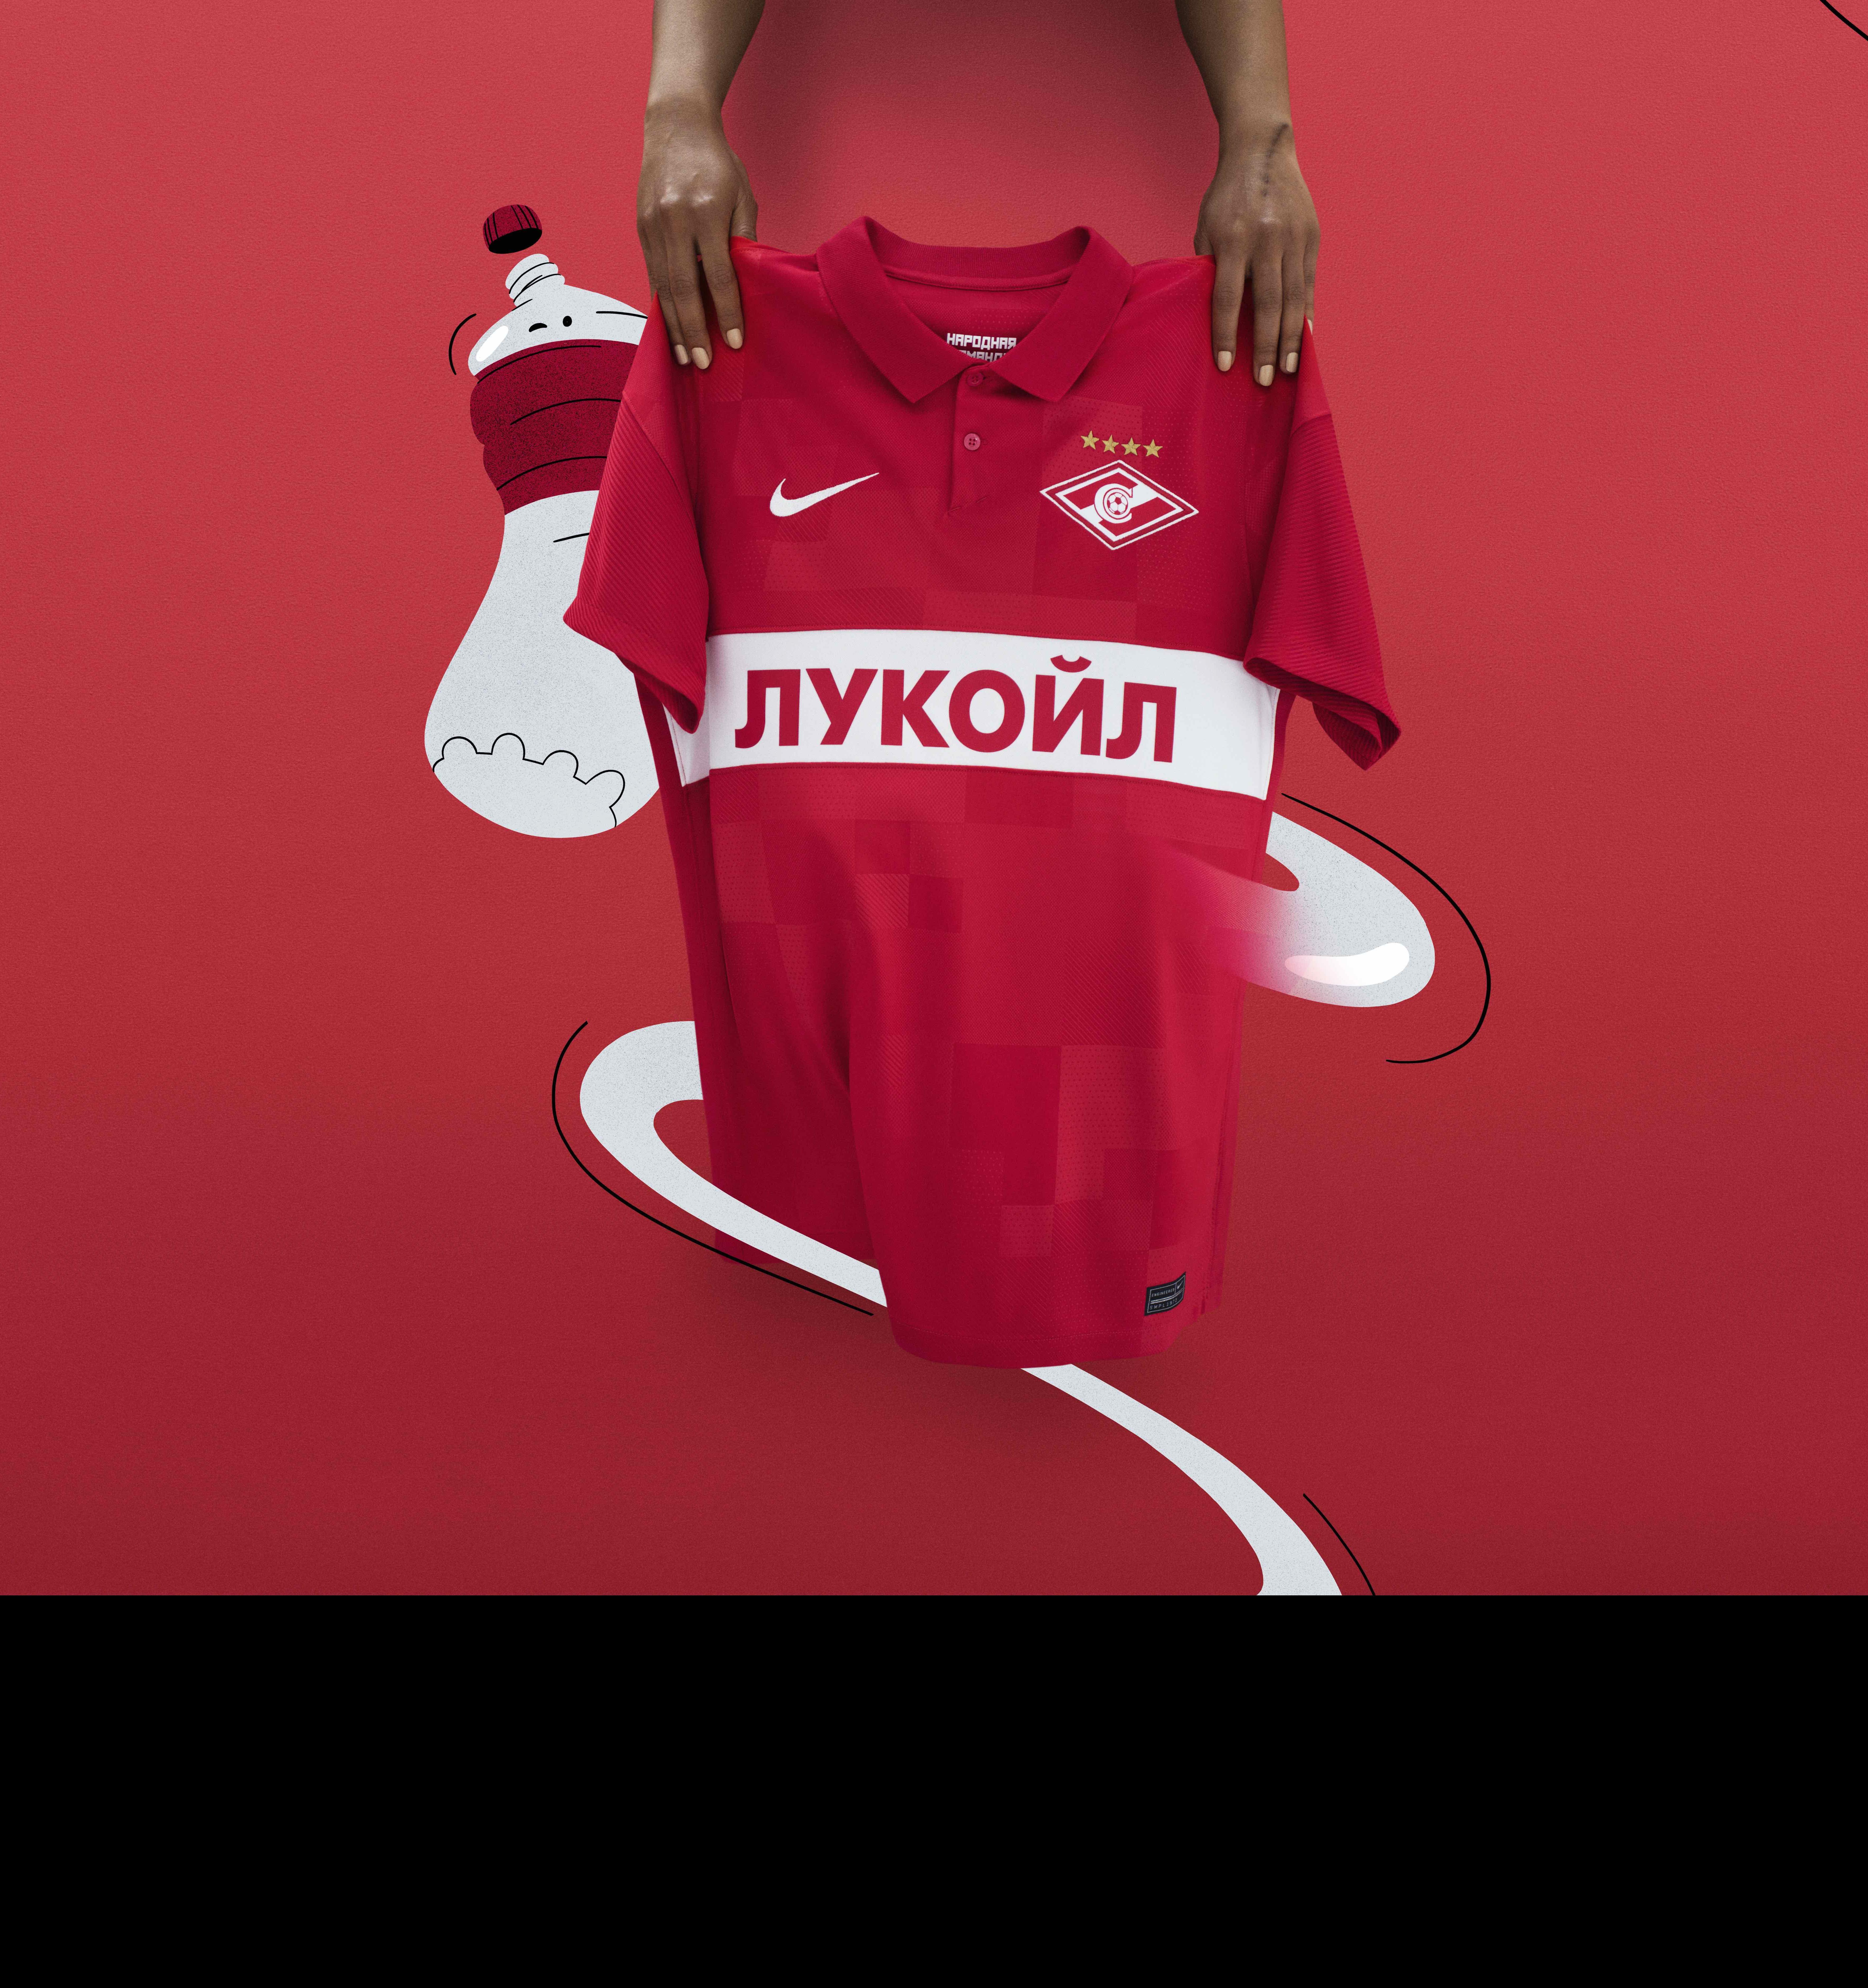 Nike представили форму «Спартак» из переработанного пластика